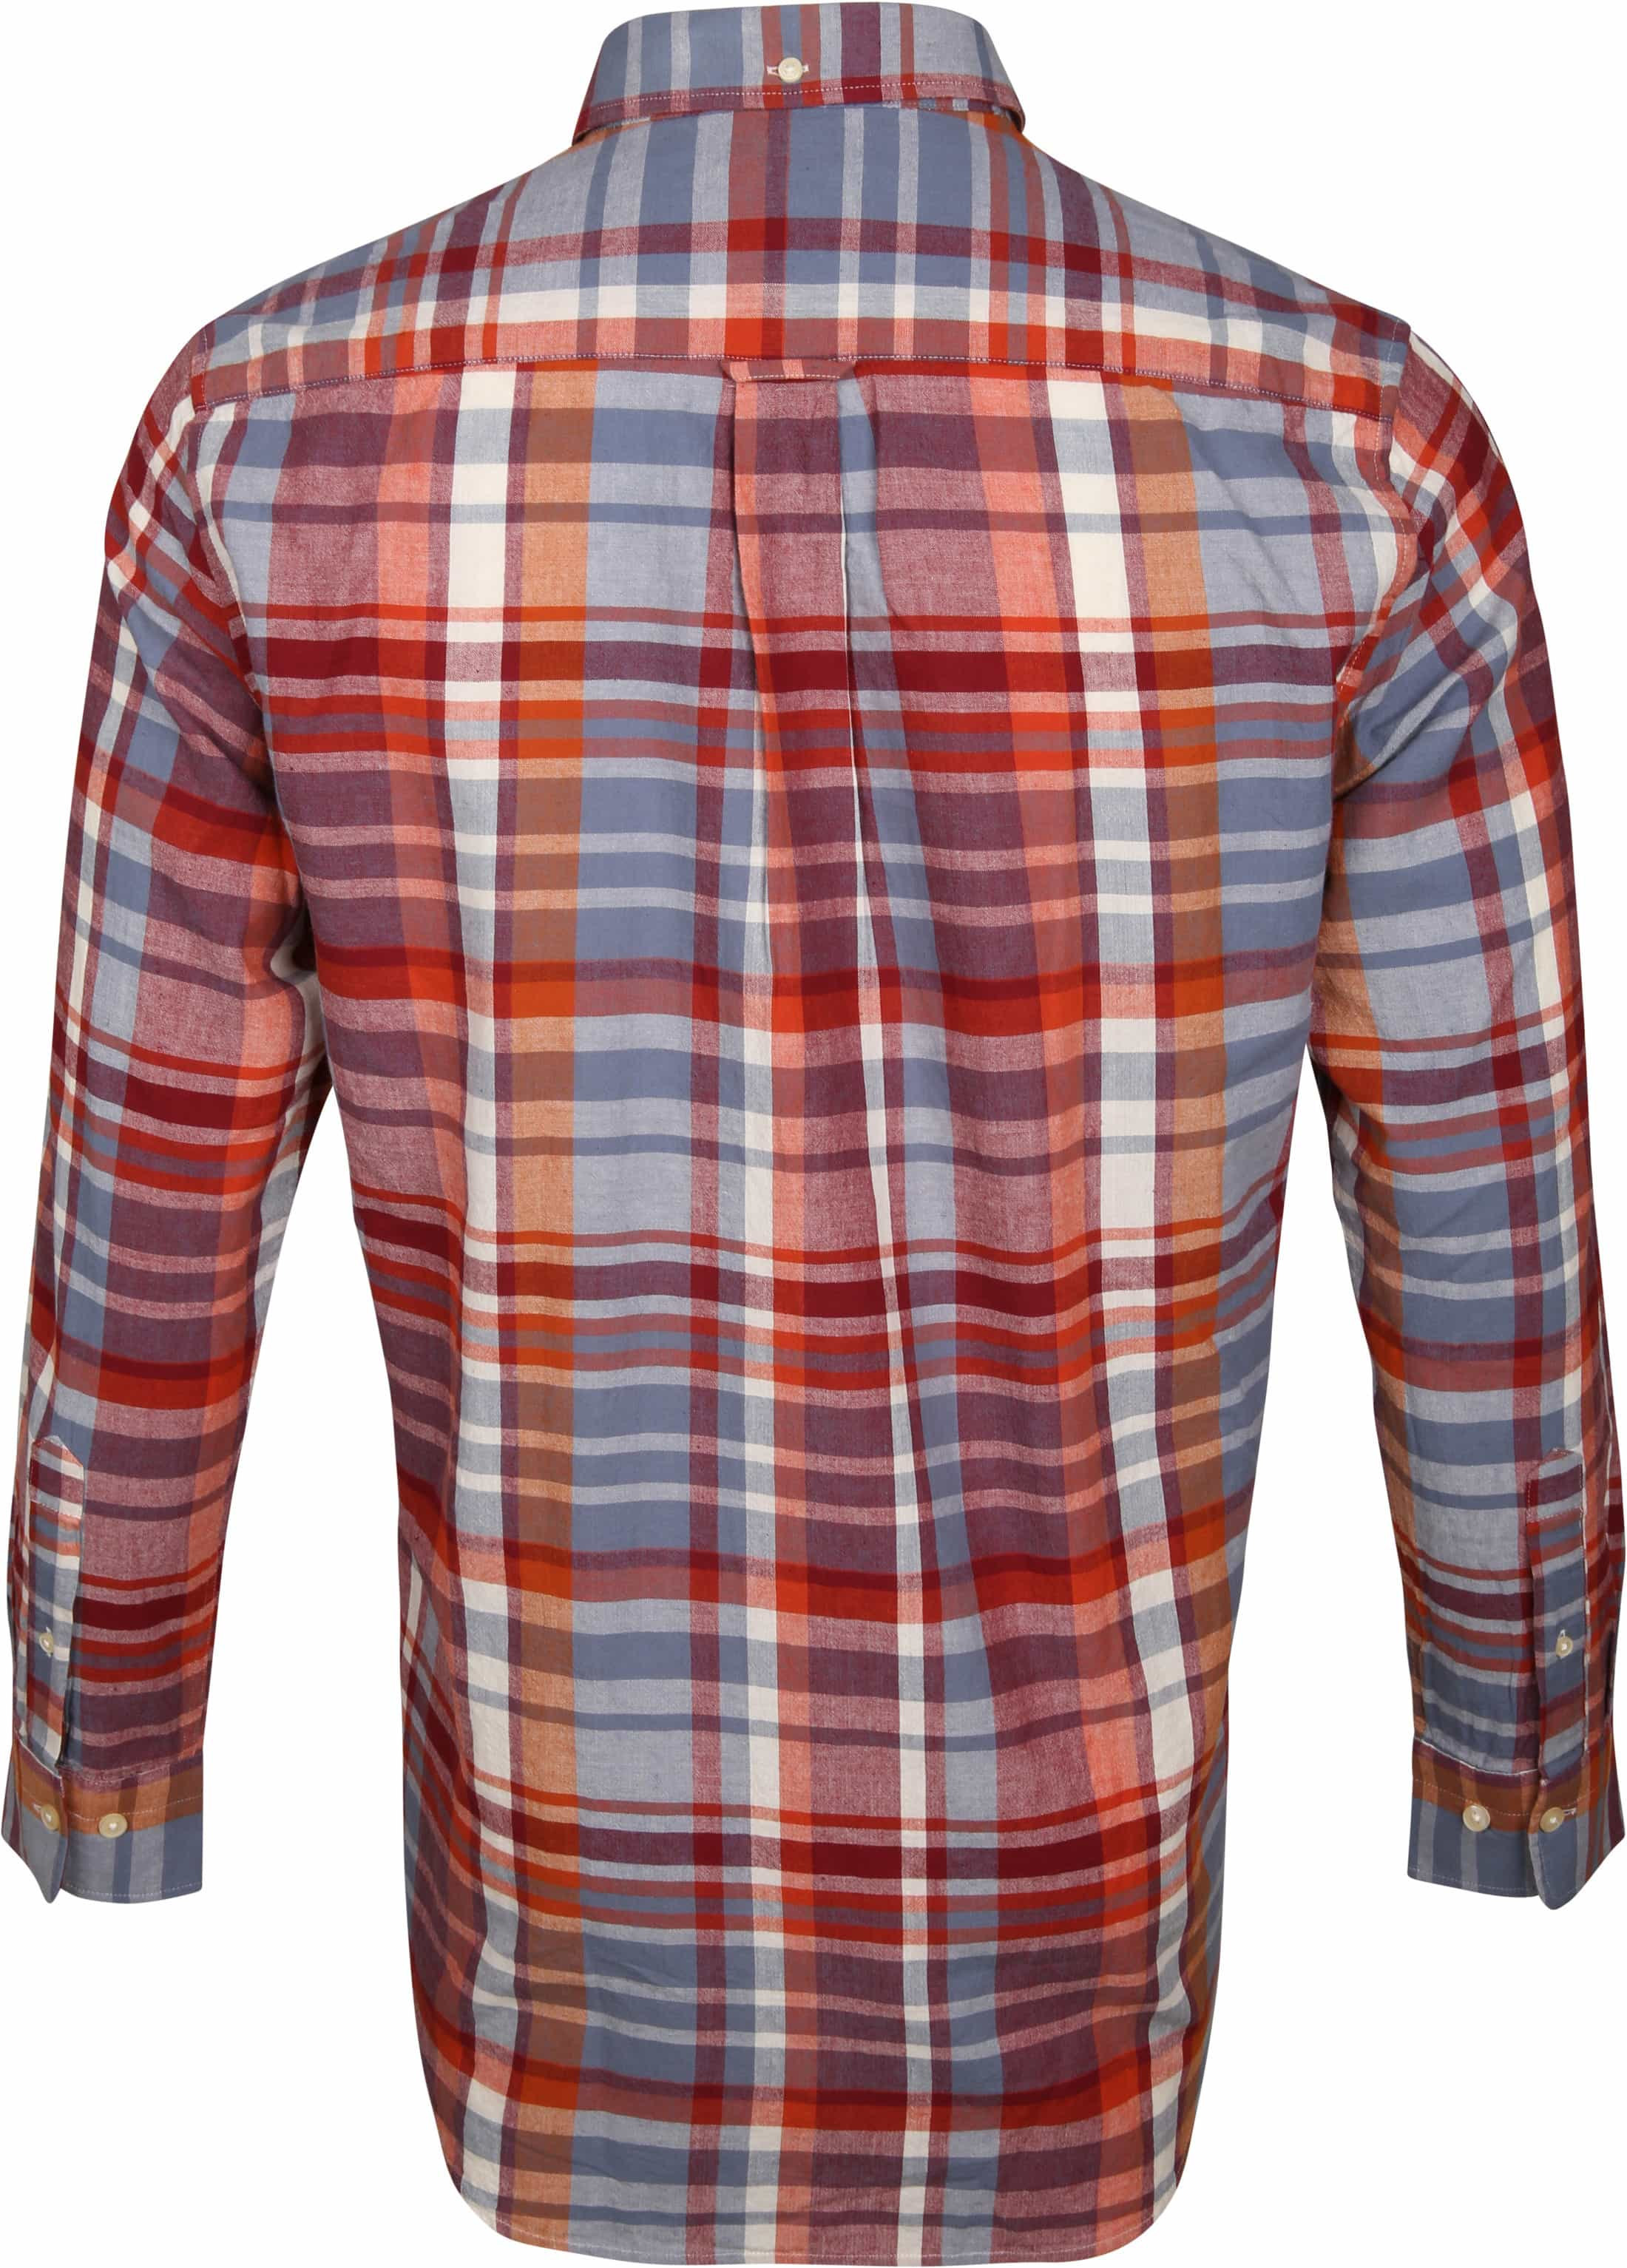 Gant Overhemd Madras Rood foto 4